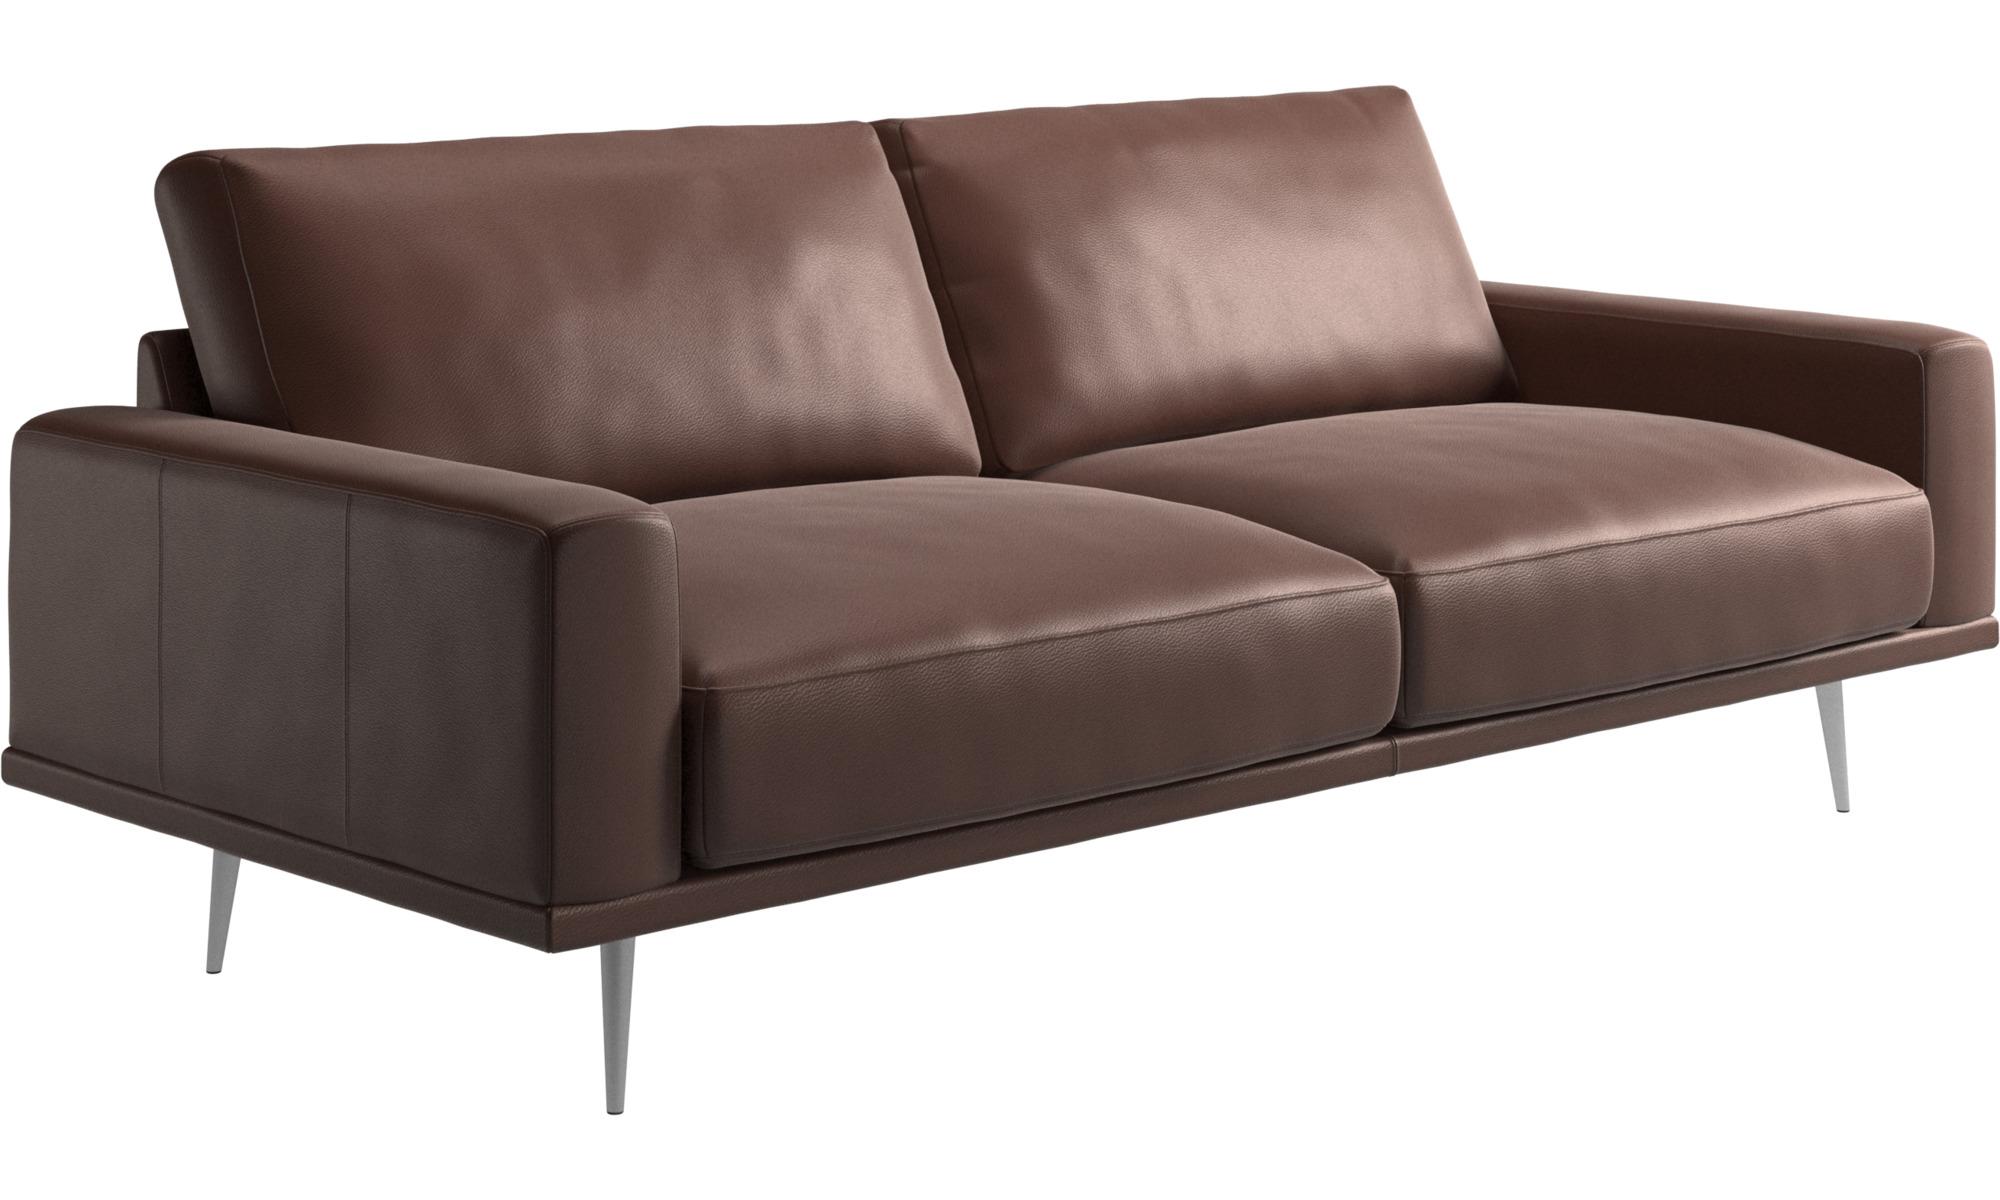 2 5 Seater Sofas Carlton Sofa Boconcept